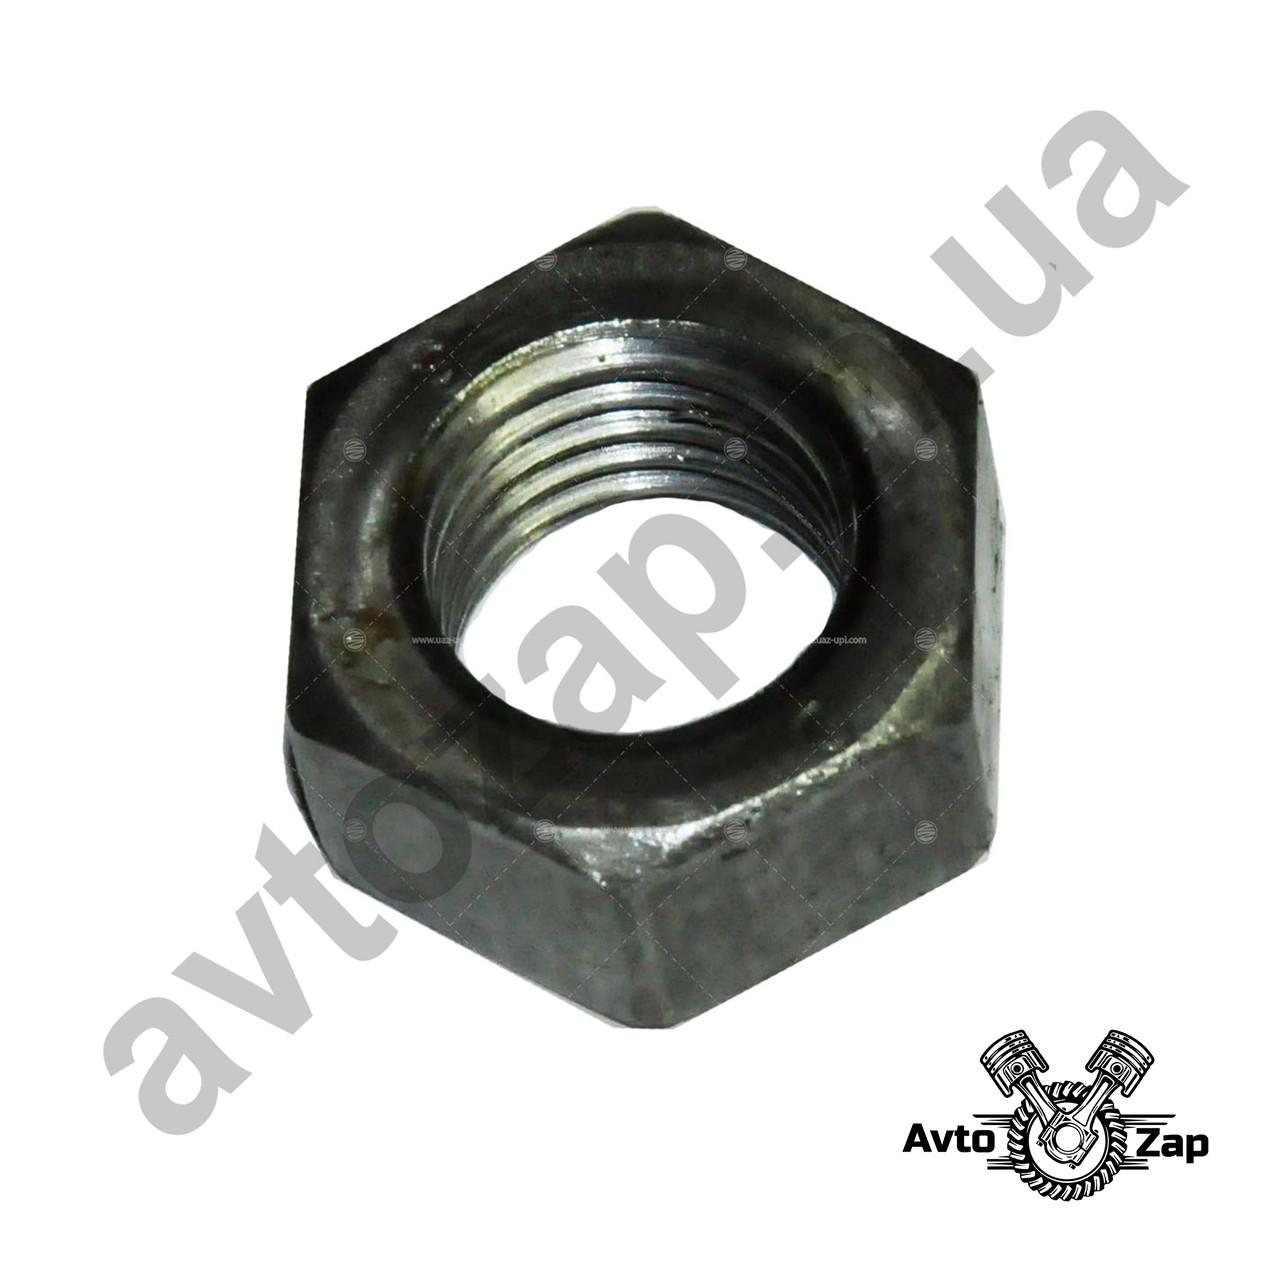 Гайка М10х1,25 амортизатора ВАЗ 2101-07 (20 шт.) п/э уп .   35861